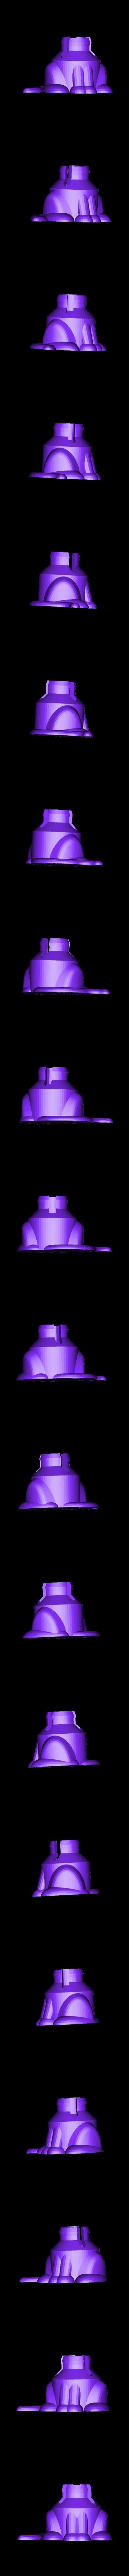 mtmk_trifix_catbottom.stl Download free STL file 3D Monstamaka • 3D printing design, mageli